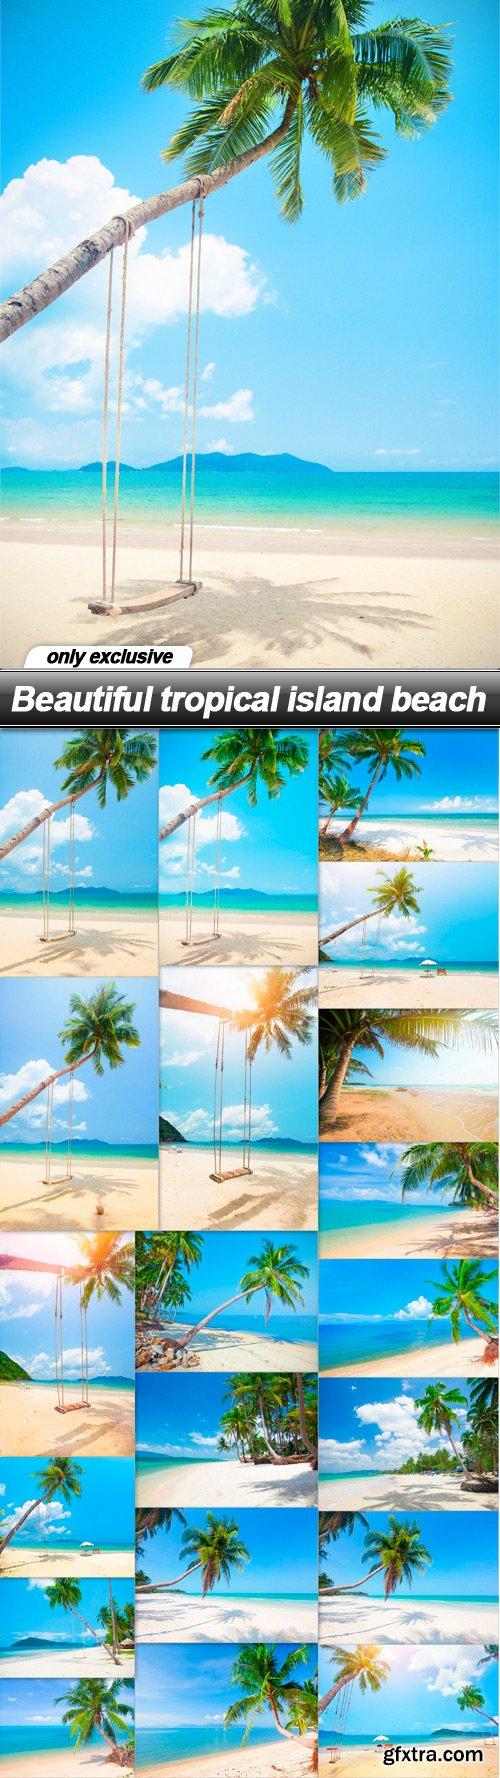 Beautiful tropical island beach - 20 UHQ JPEG